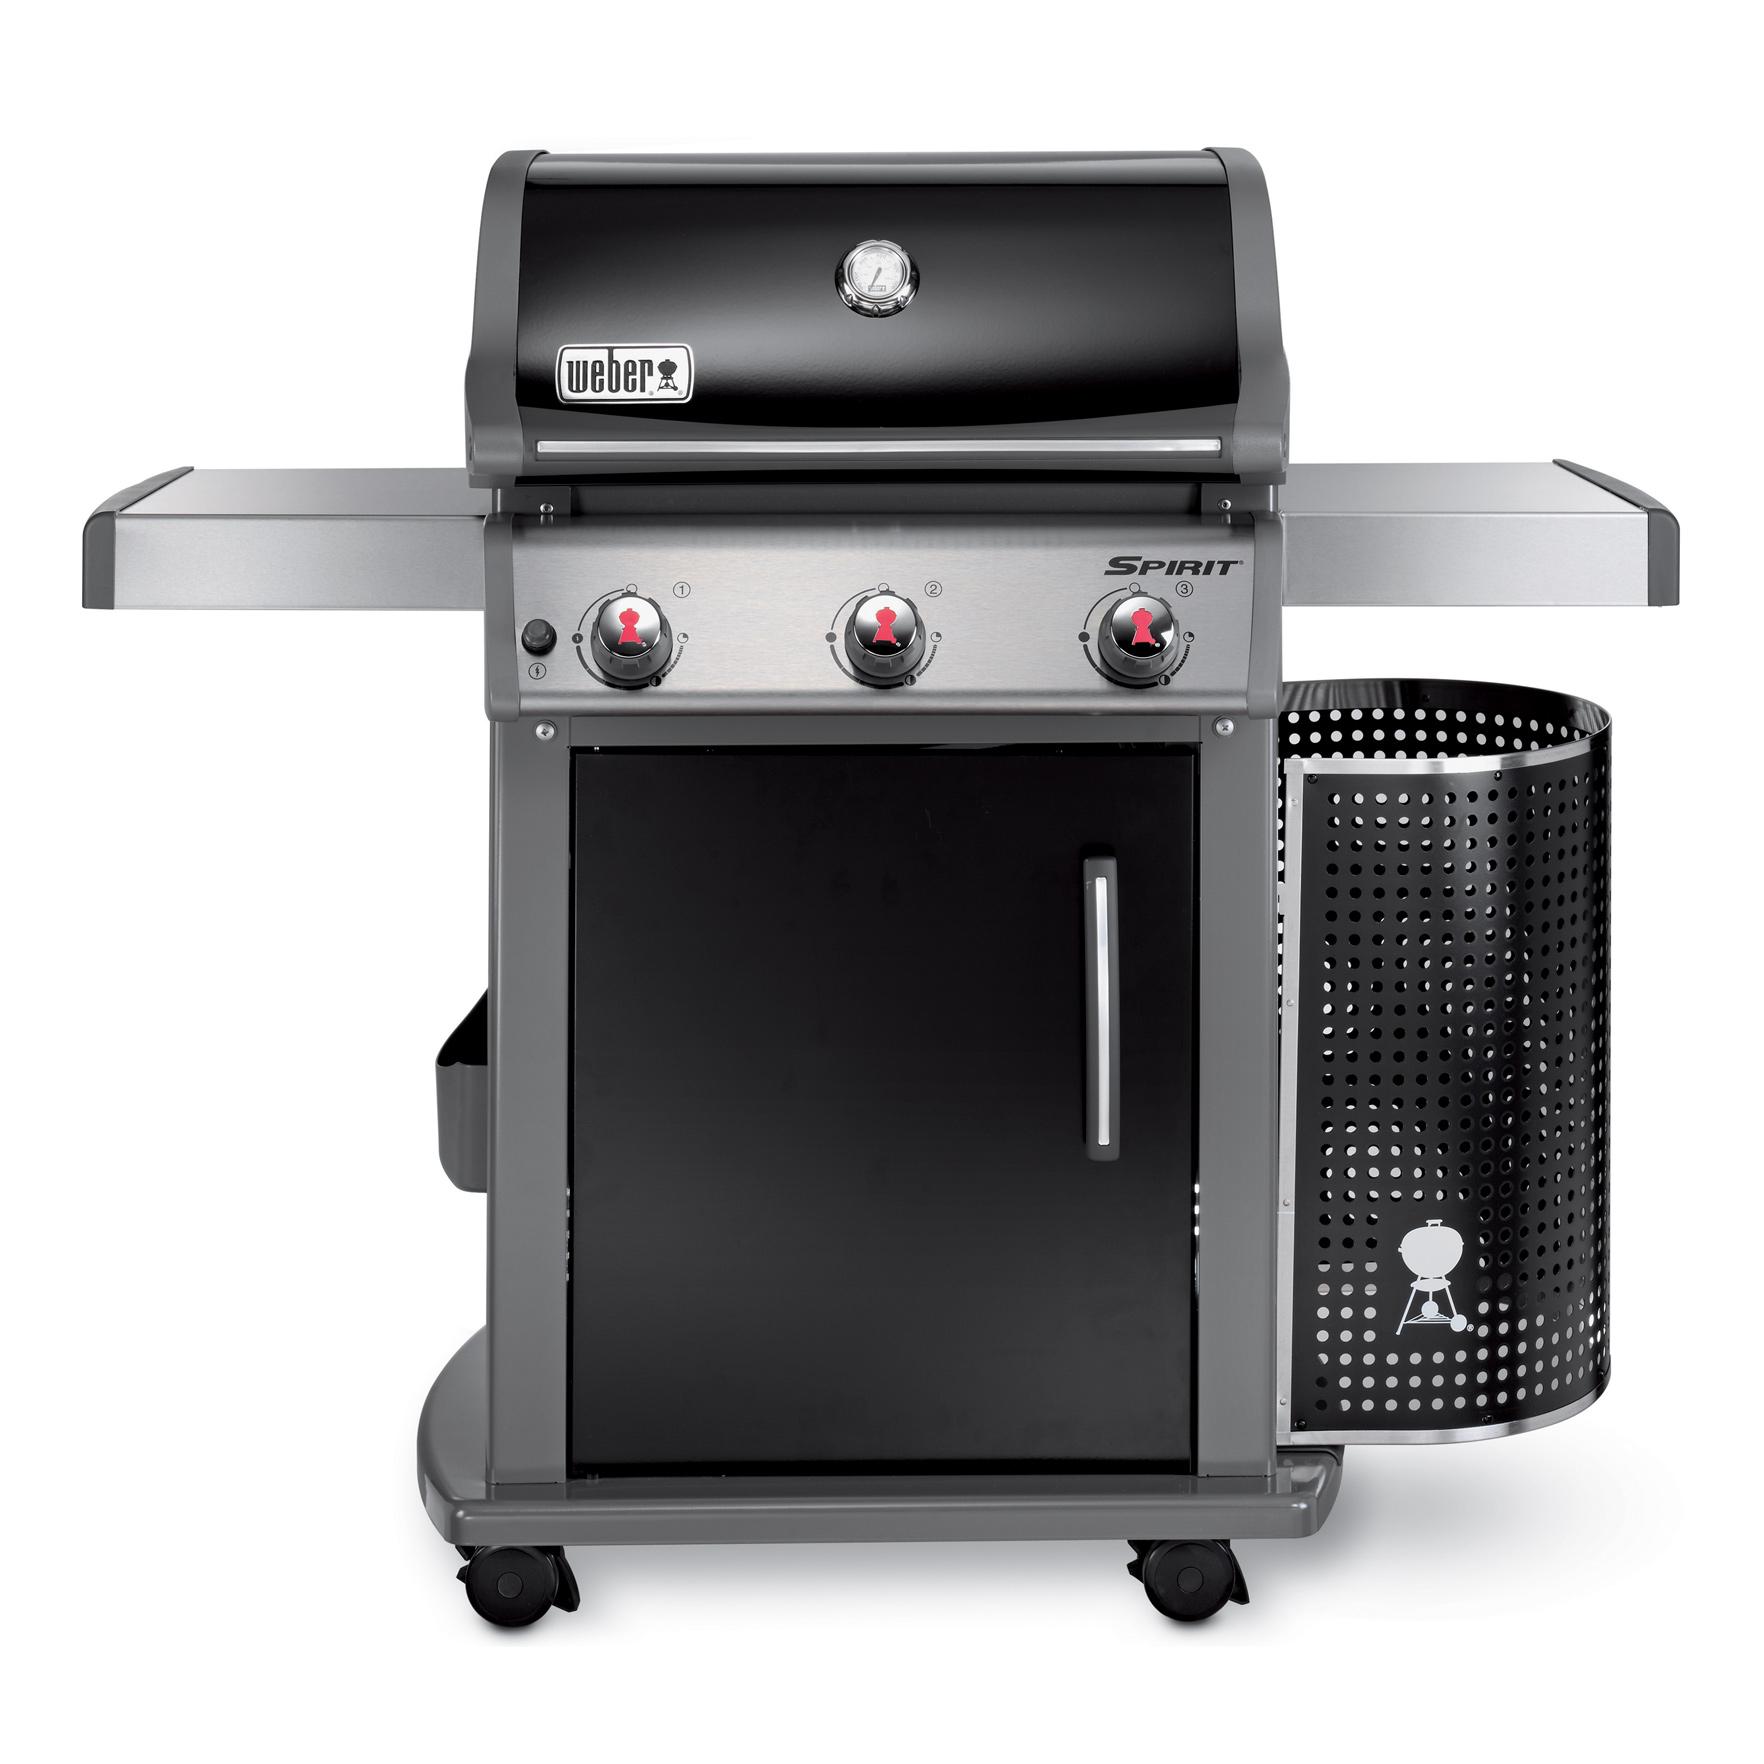 weber gasgrill spirit e 310 premium black mit elektronischer z ndung 46510379 ebay. Black Bedroom Furniture Sets. Home Design Ideas